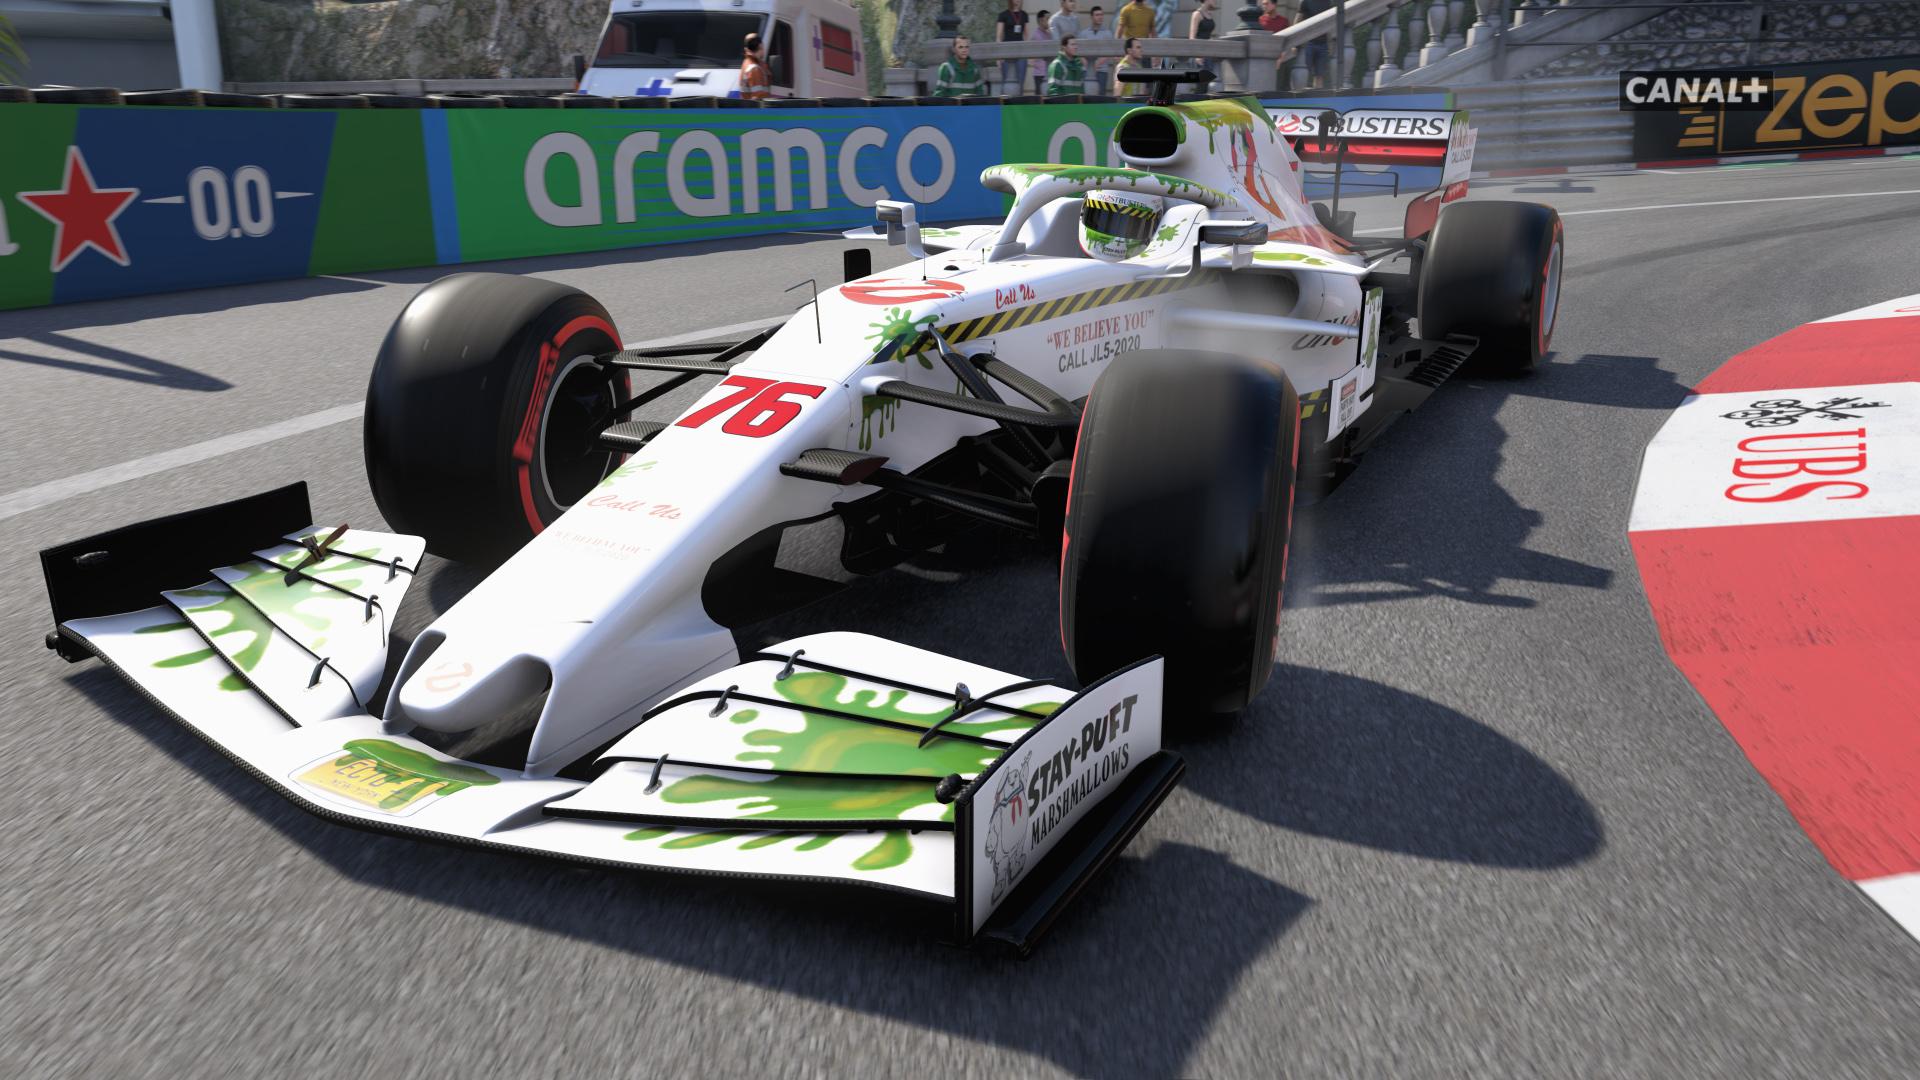 F1_2020_photo_20210608_214657.jpg